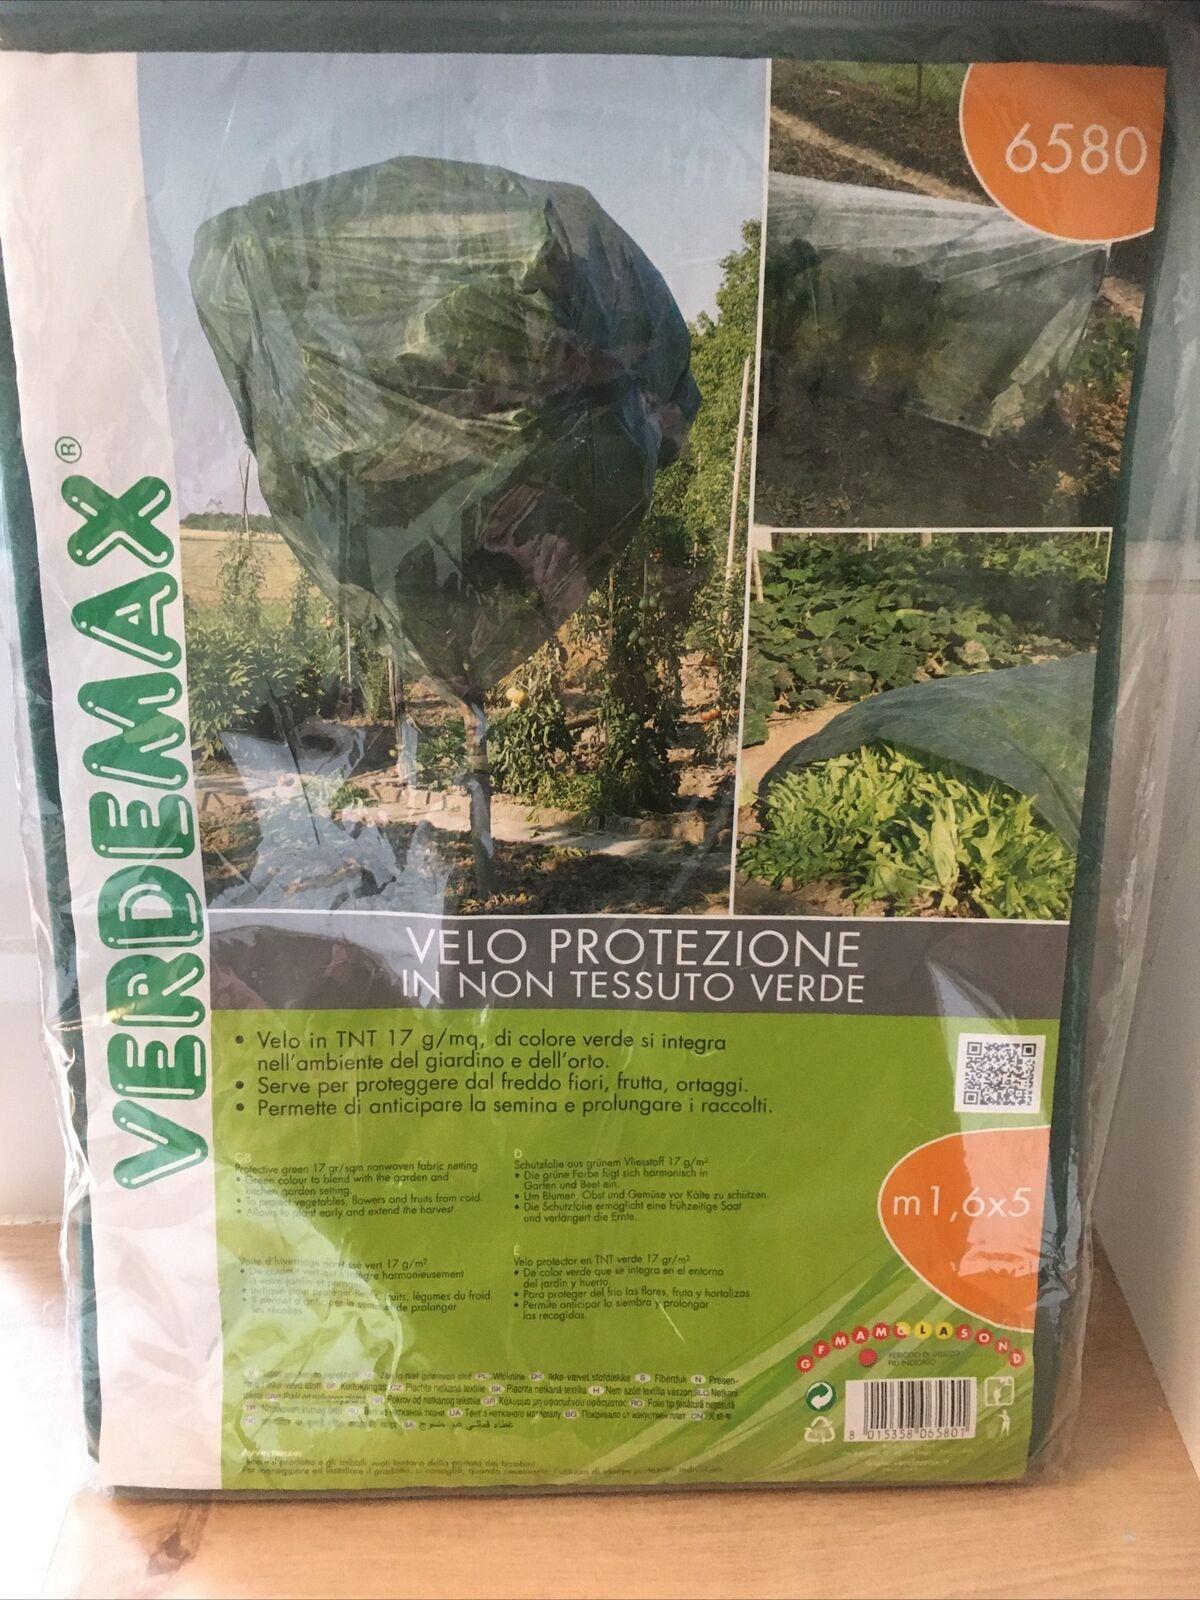 Heavy Duty Plant Fleece Cover Frost Protection Warming Jacket Bush Tree 17g/mq